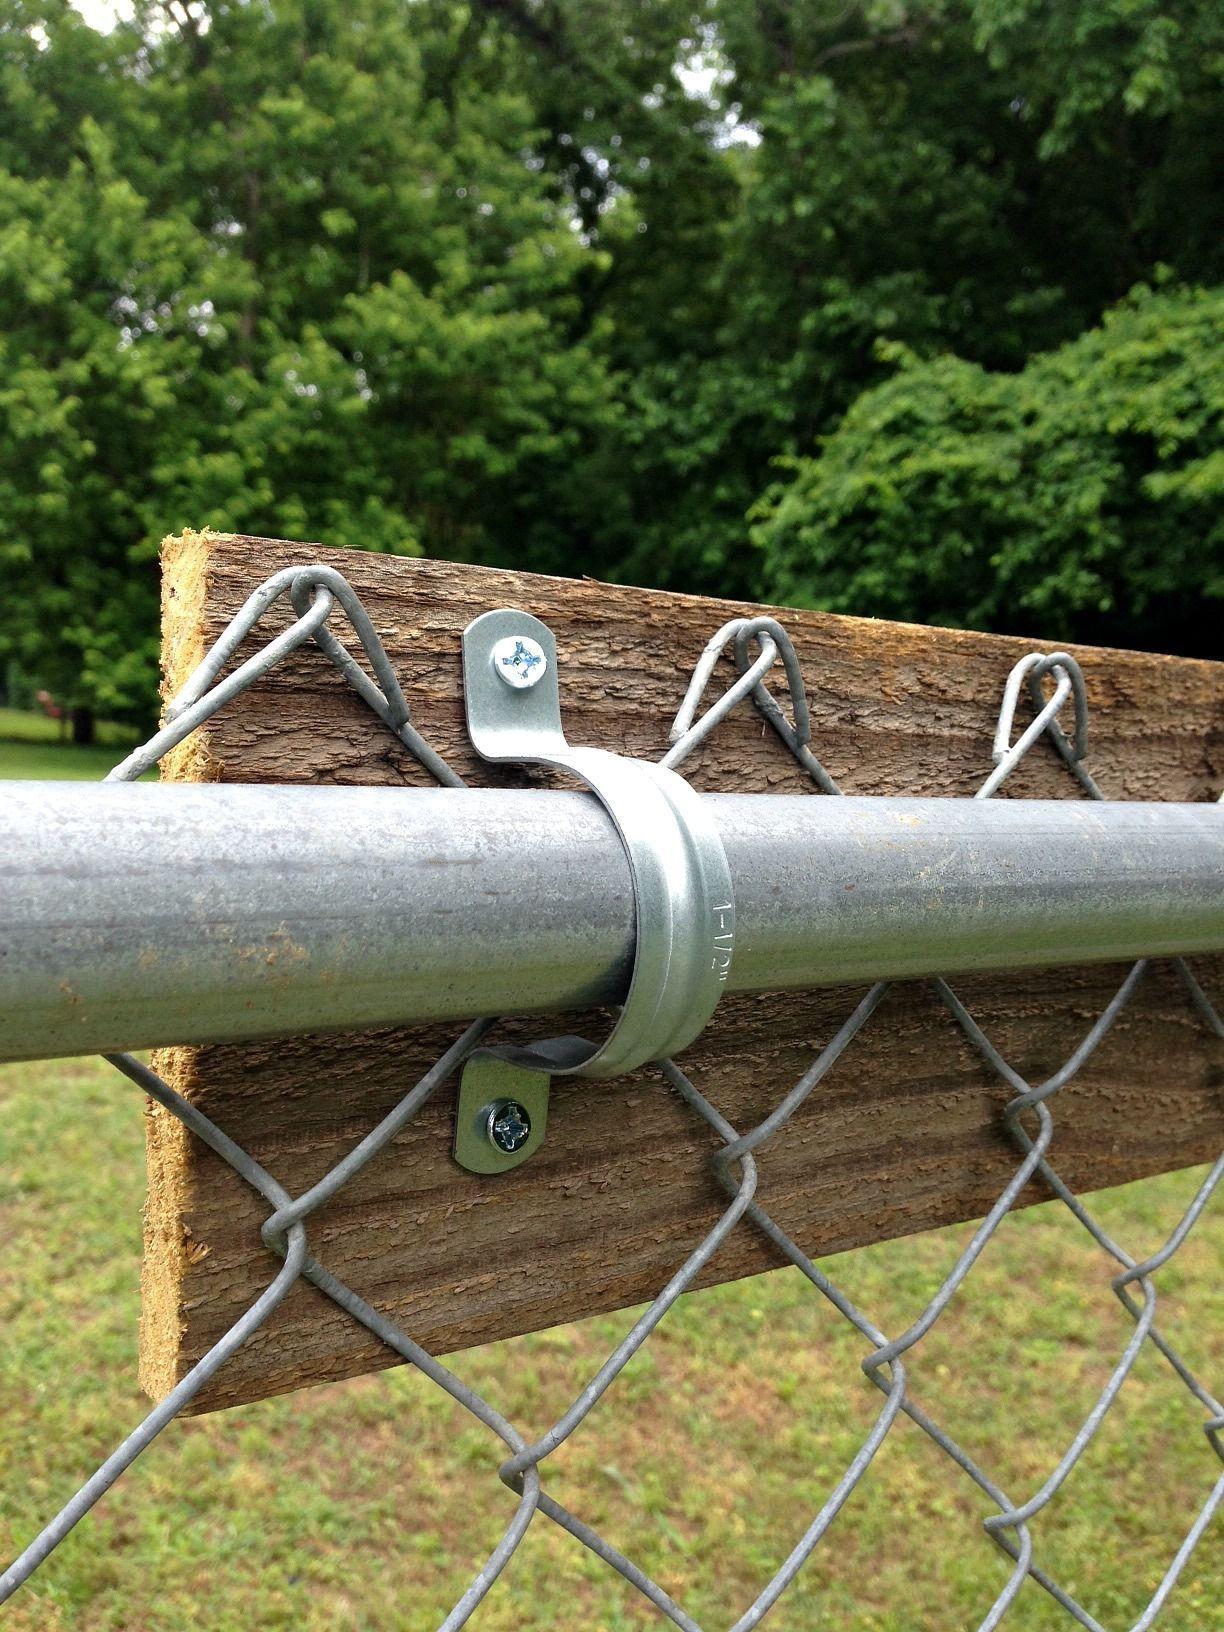 Fence Decor Backyard Garden Ideas BackyardGarden